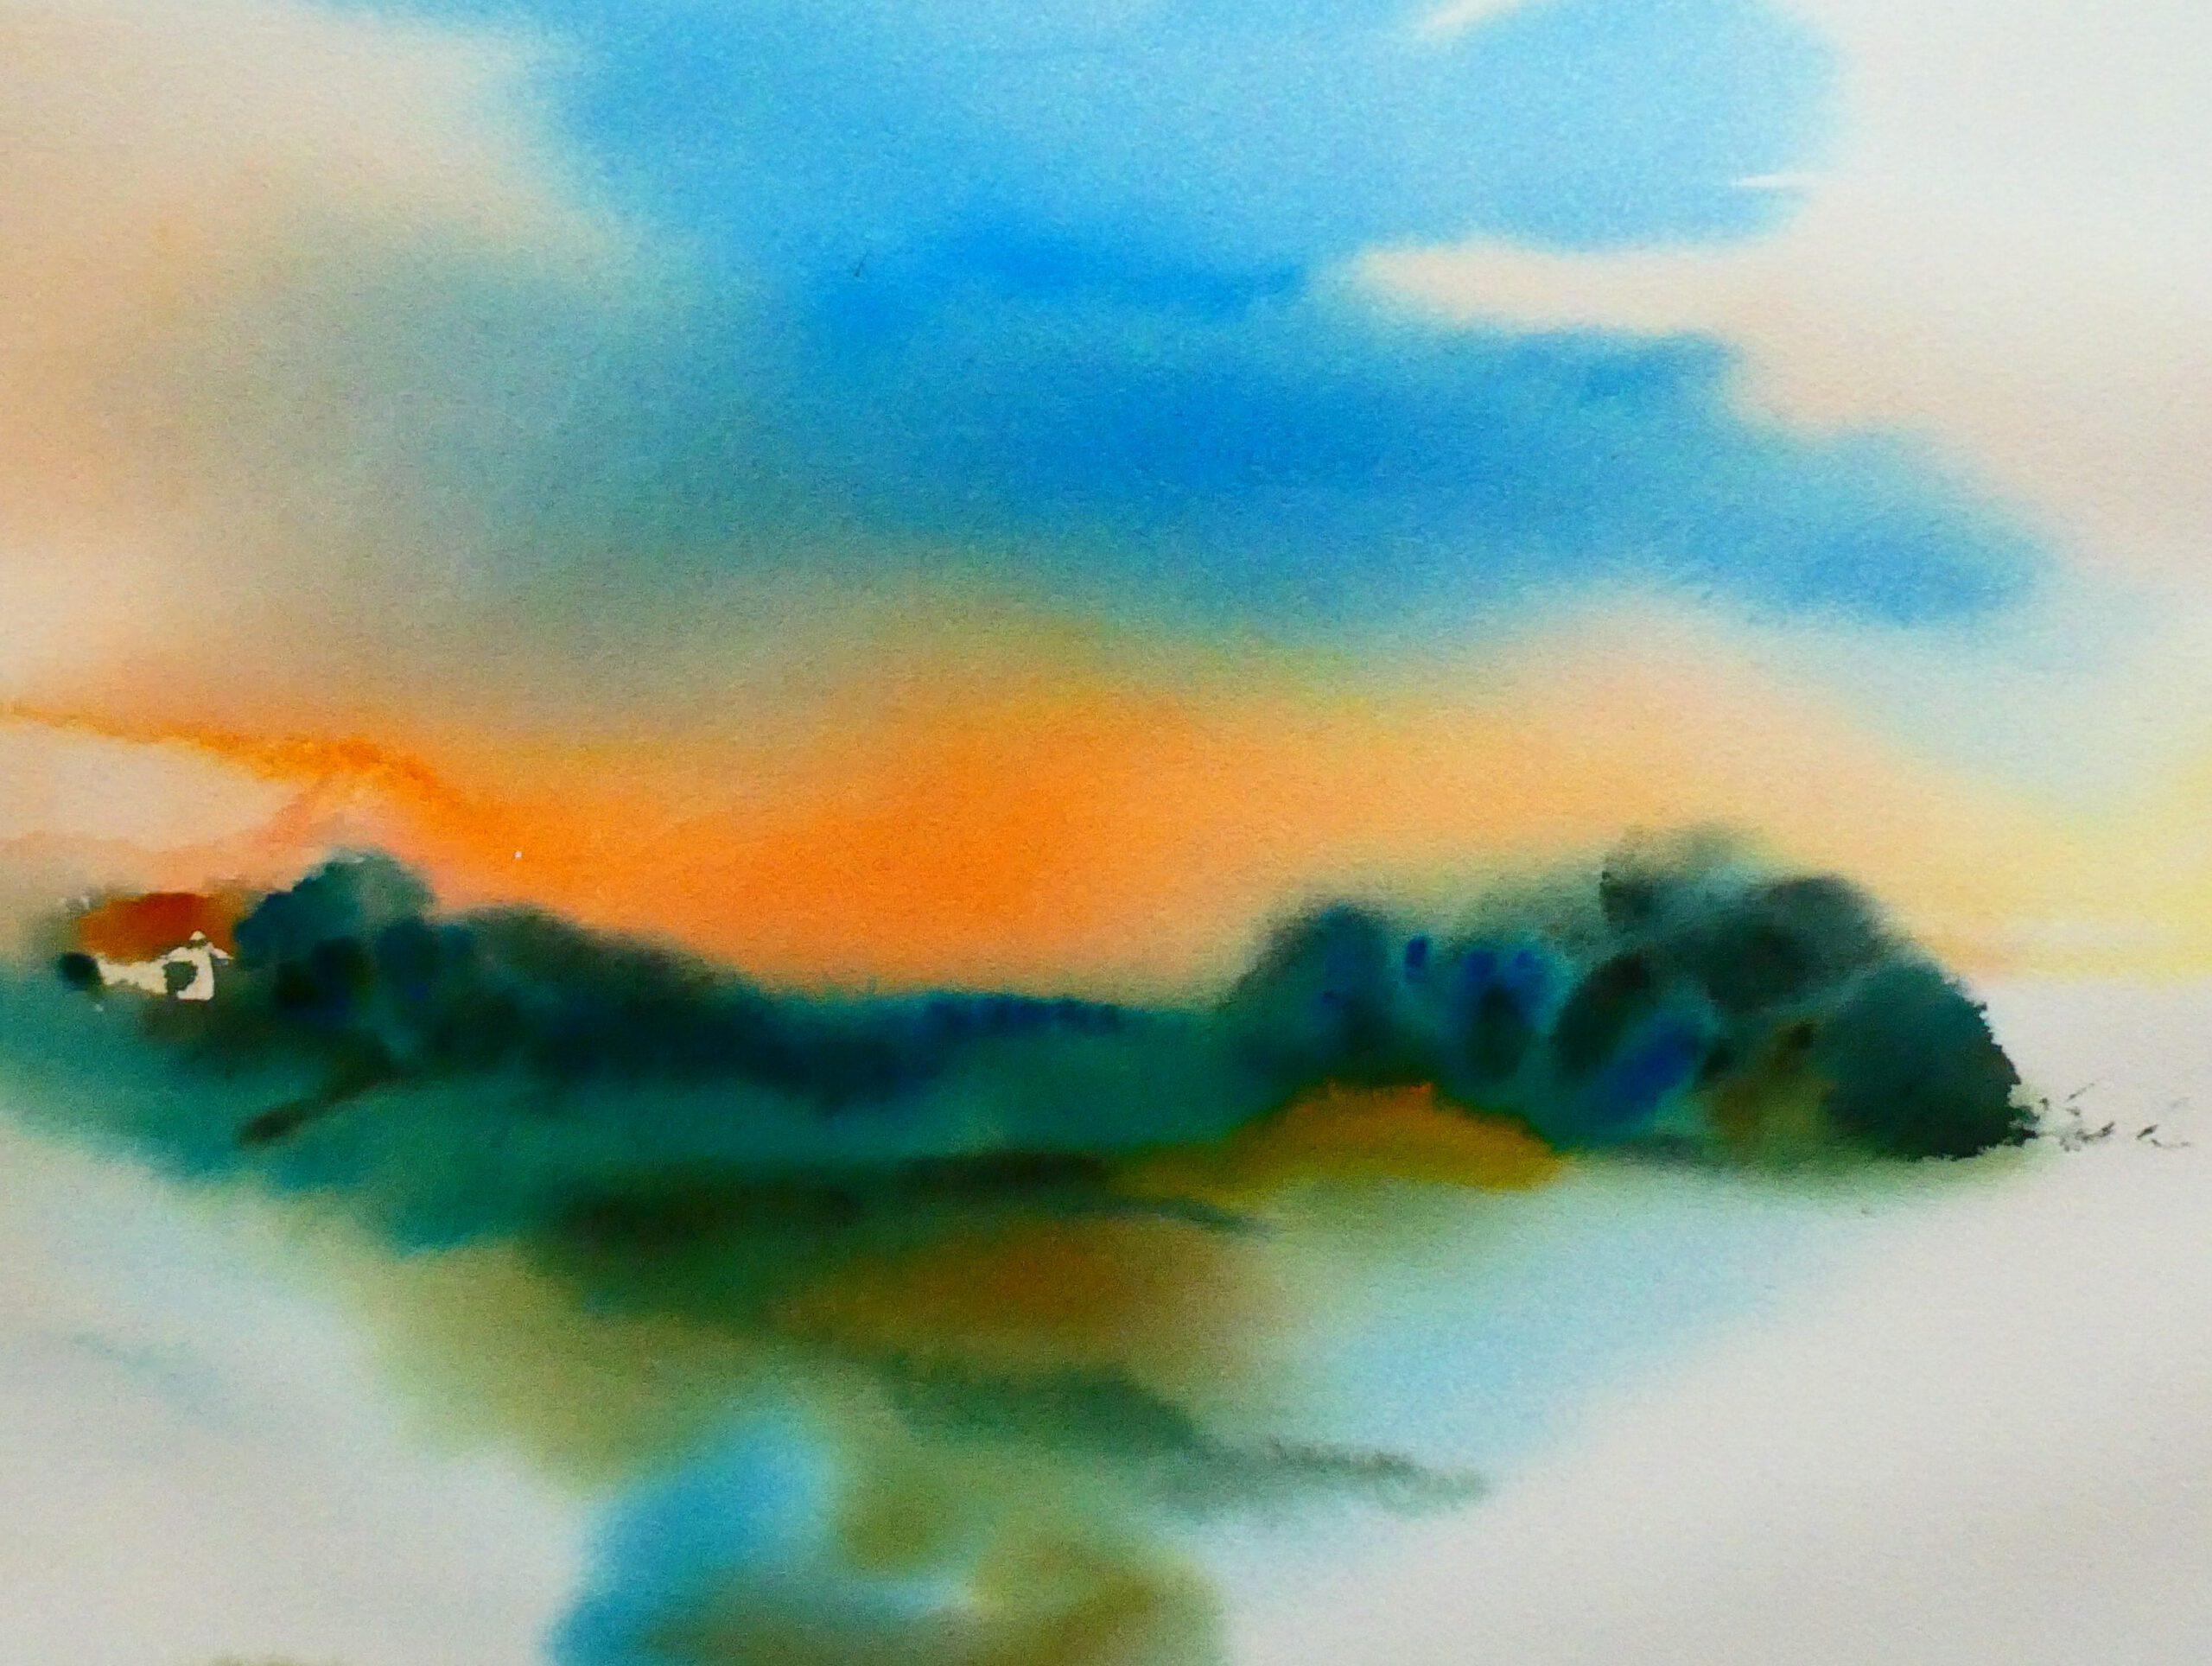 Aquarell, 80 x 60 cm